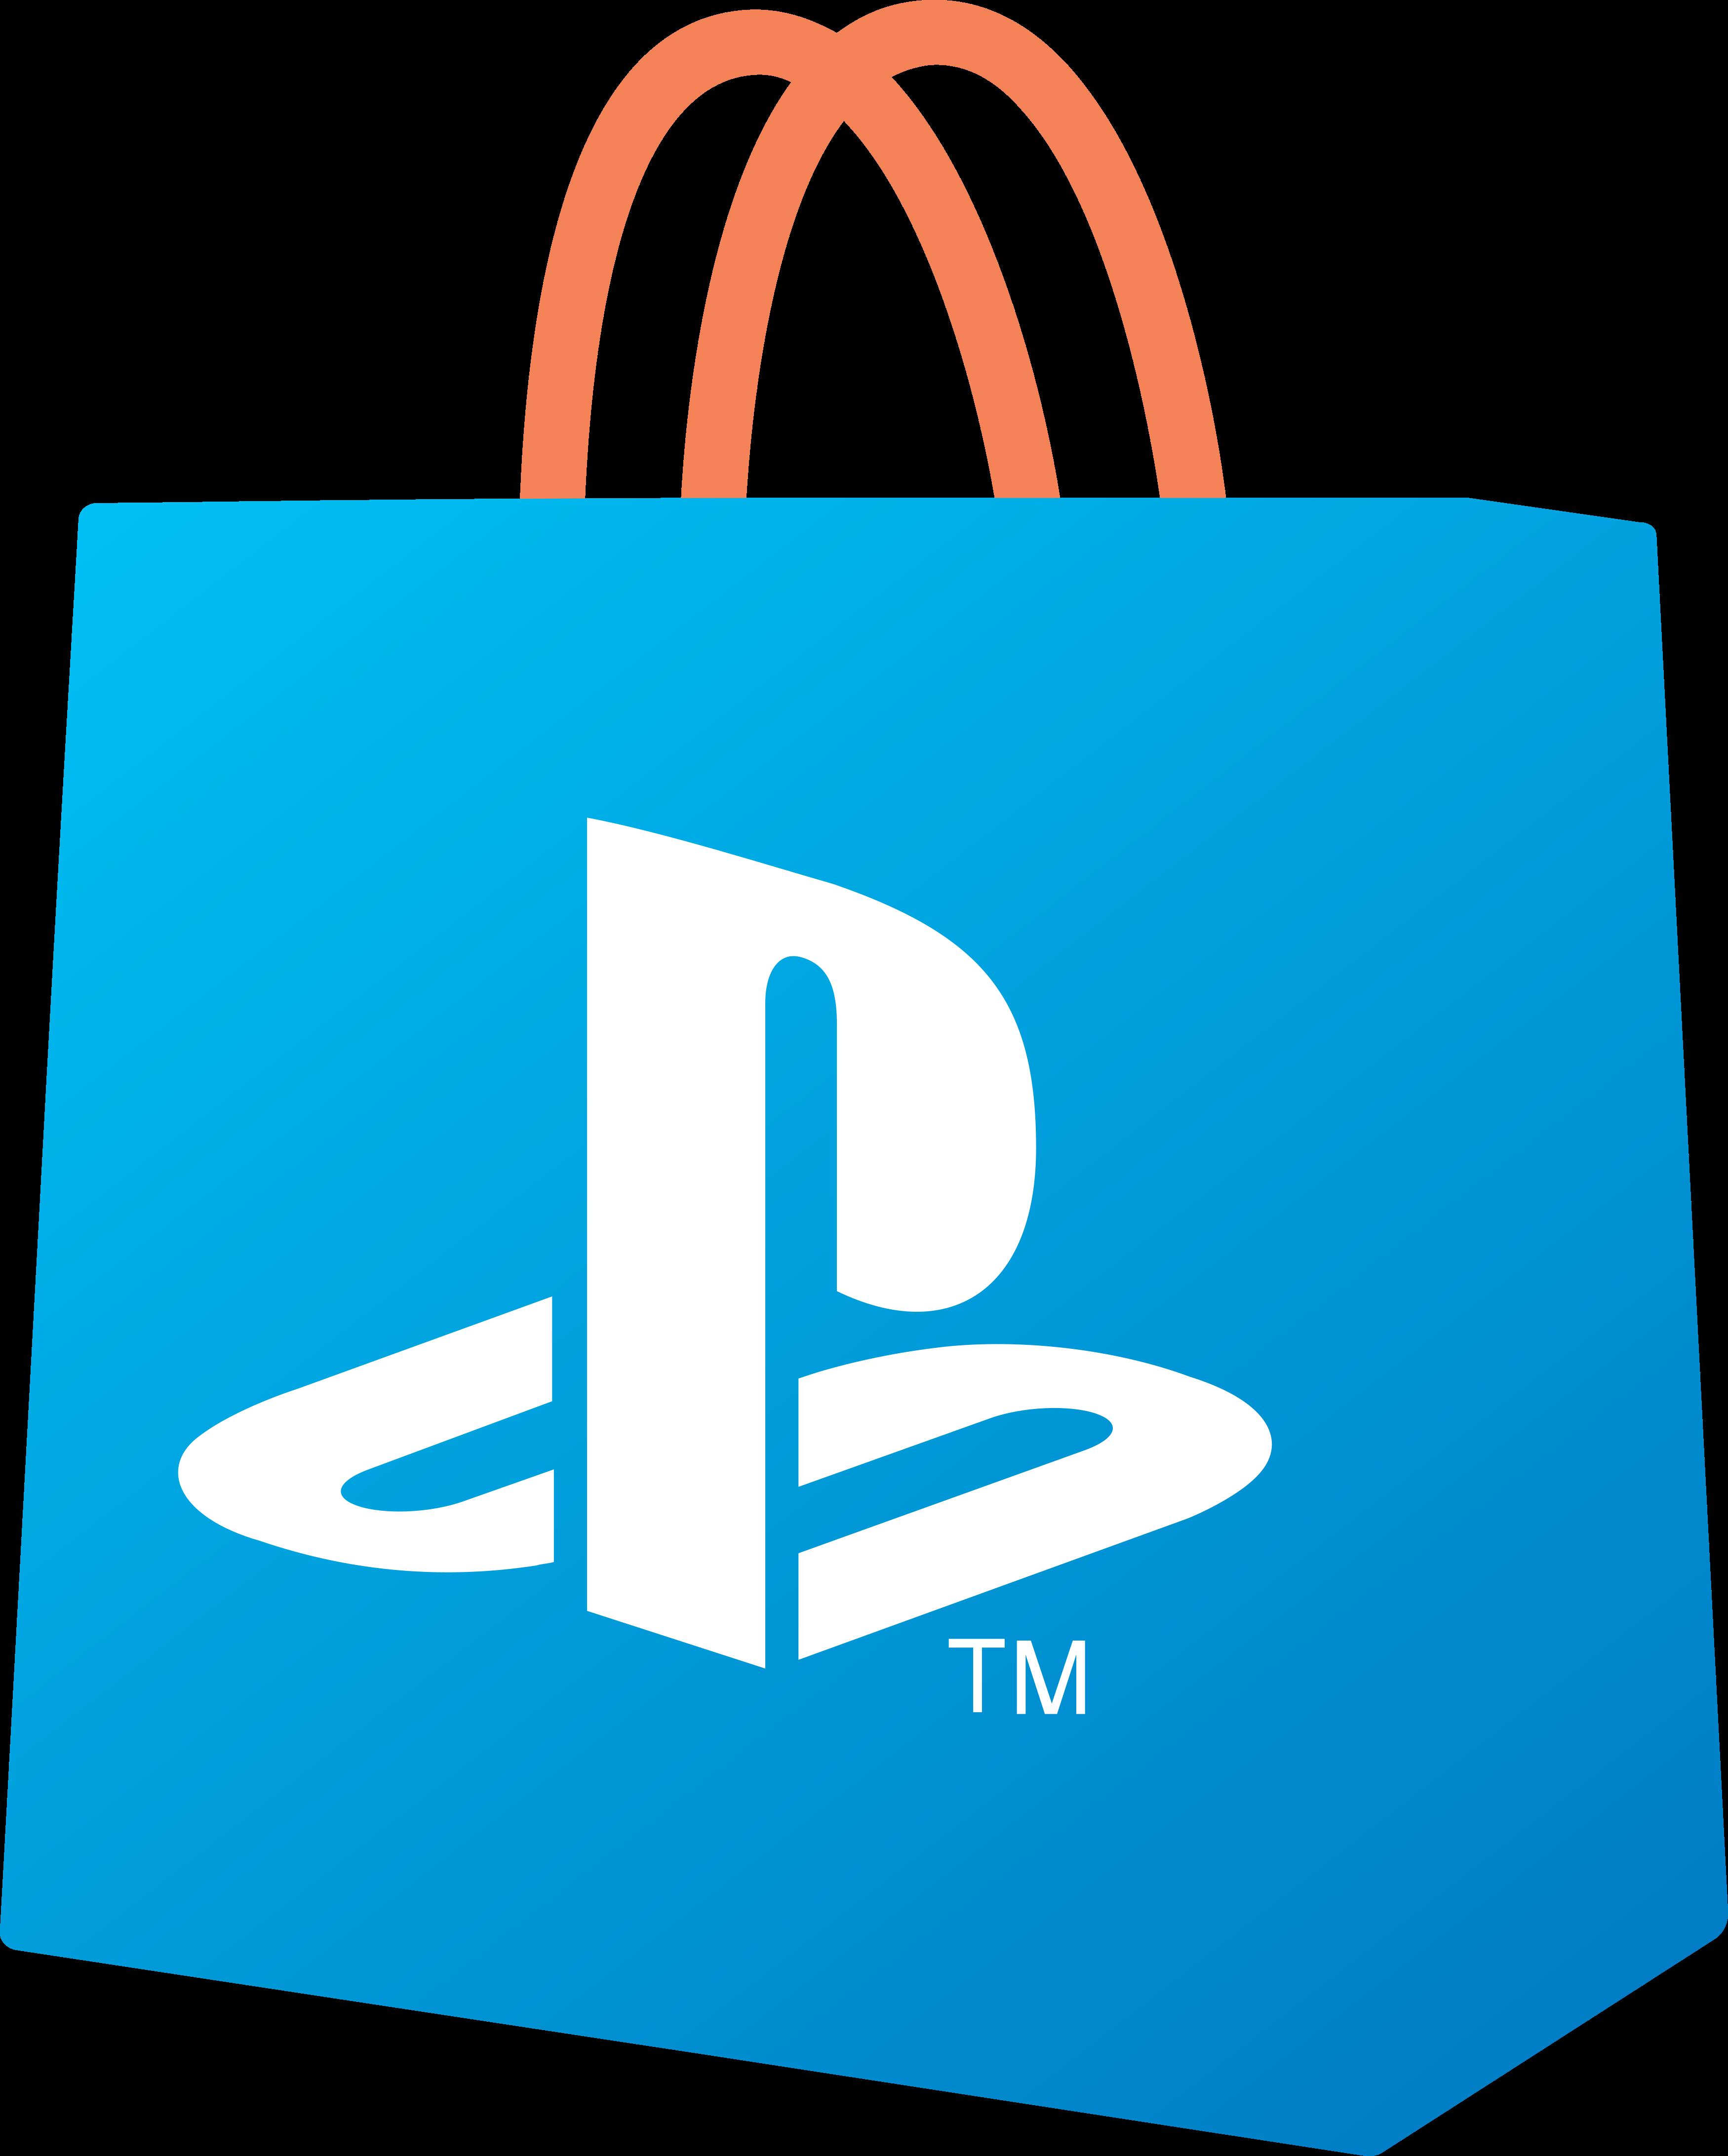 playstation store logo 1 - PlayStation Store Logo